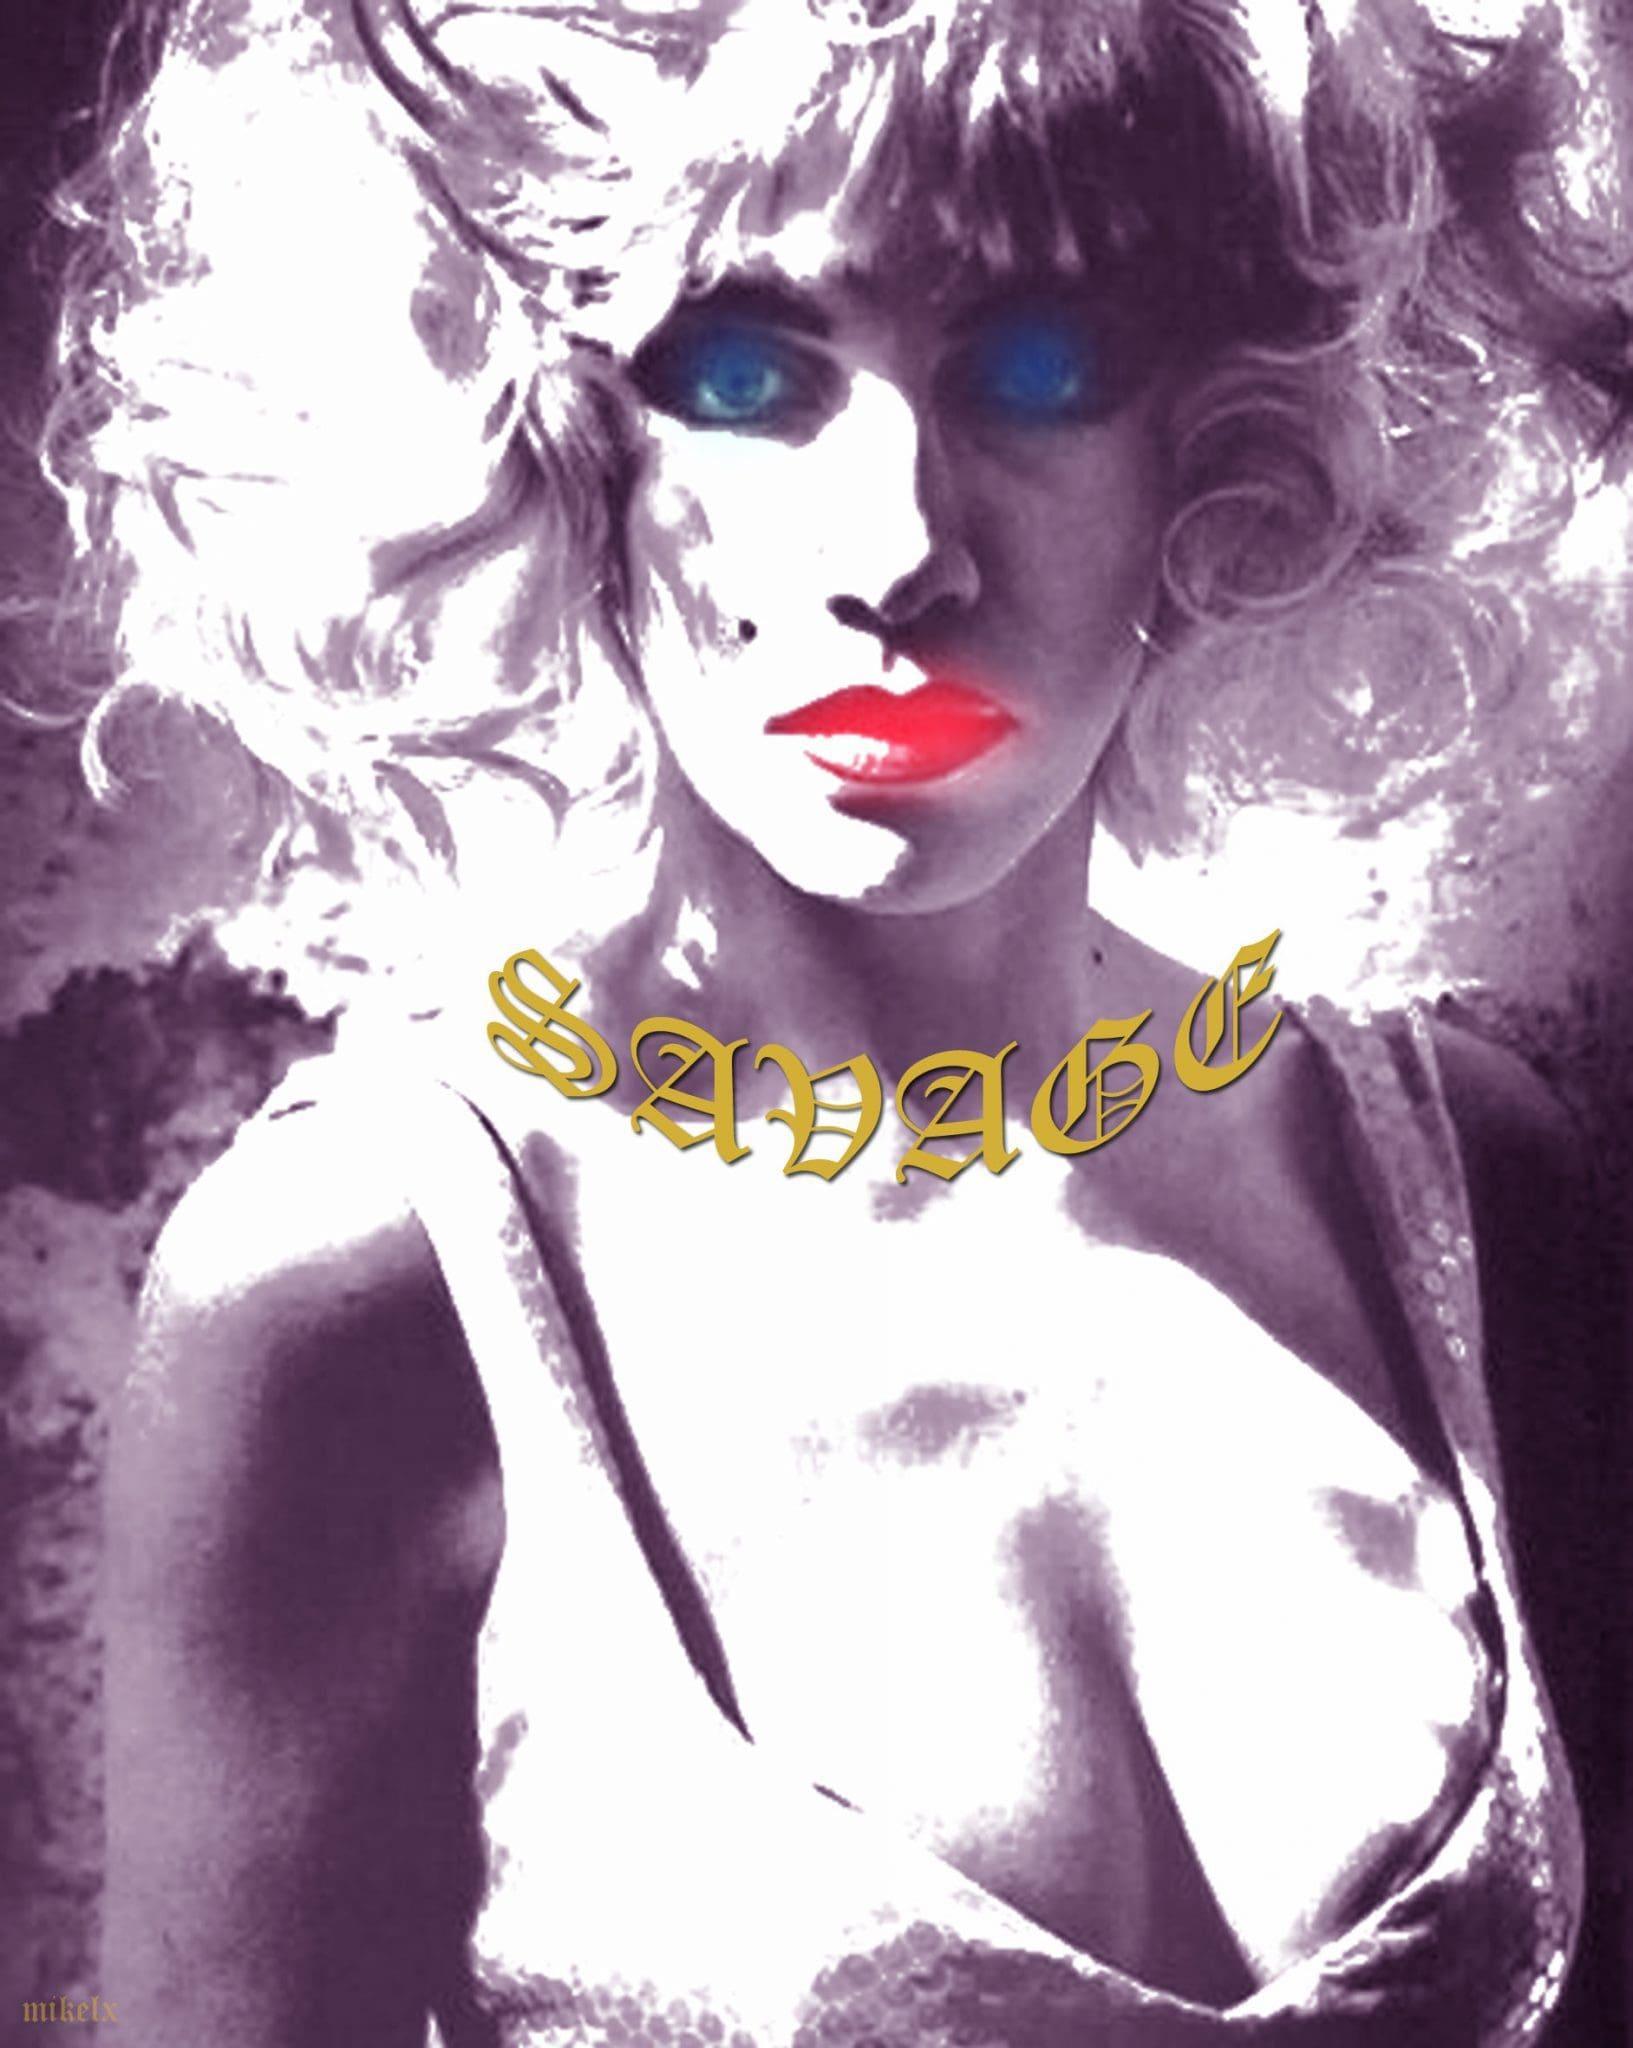 Eurythmics Savage25: Fans Artwork – Michelle Aversa